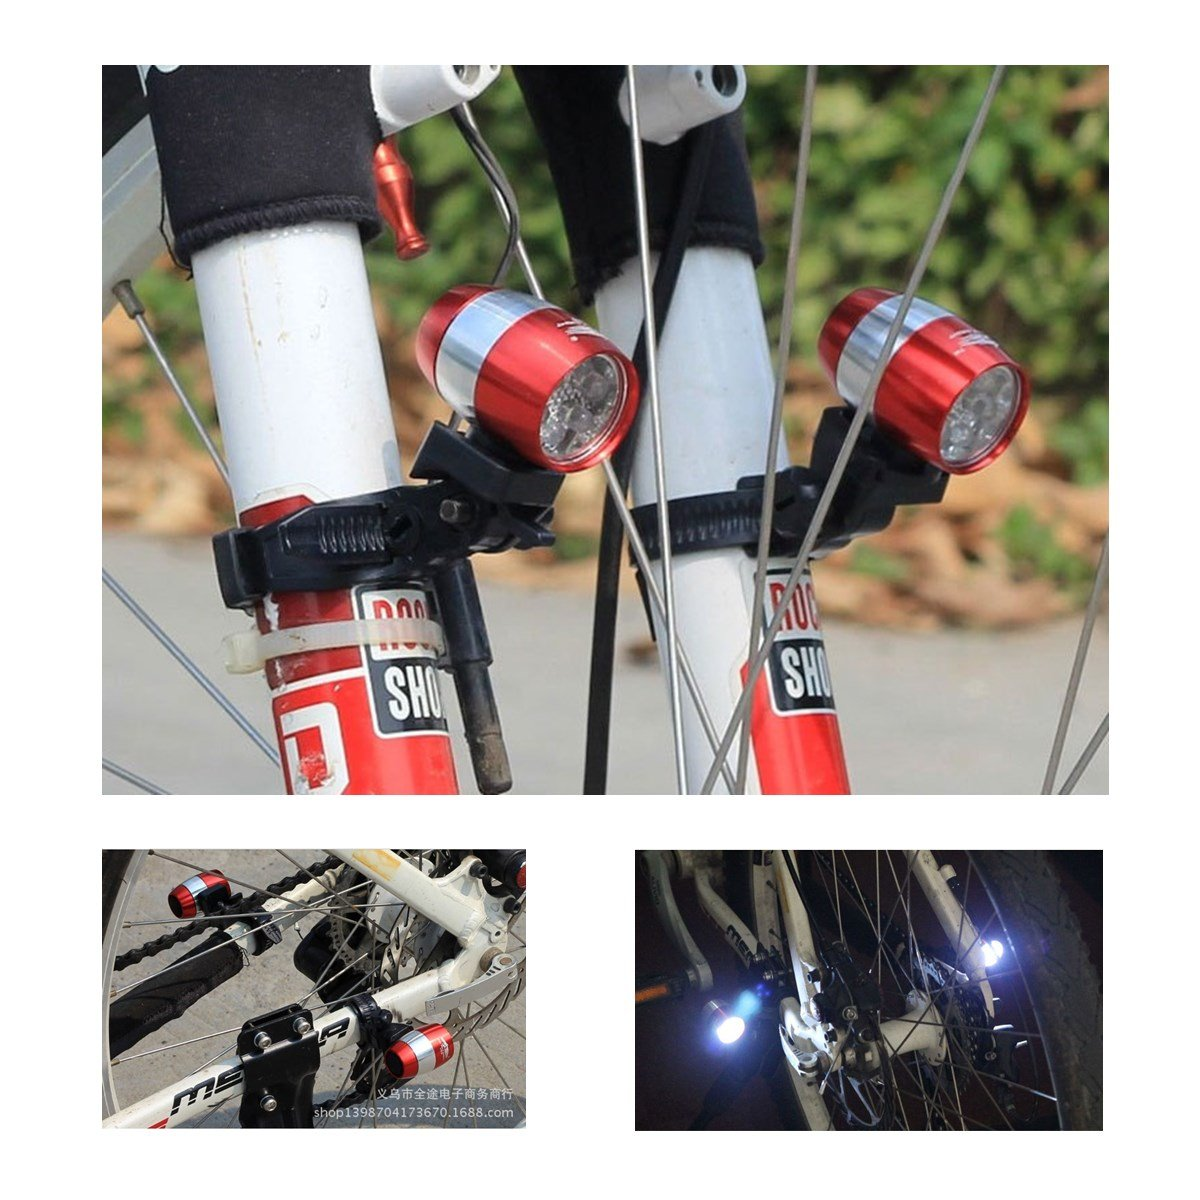 LIKE CYLING AI 6 LED Bike Lights Set Bicycle Waterproof USB Rechargeable Back(Red) Lamp Cycling Flashlight Lights Sets 2pcs